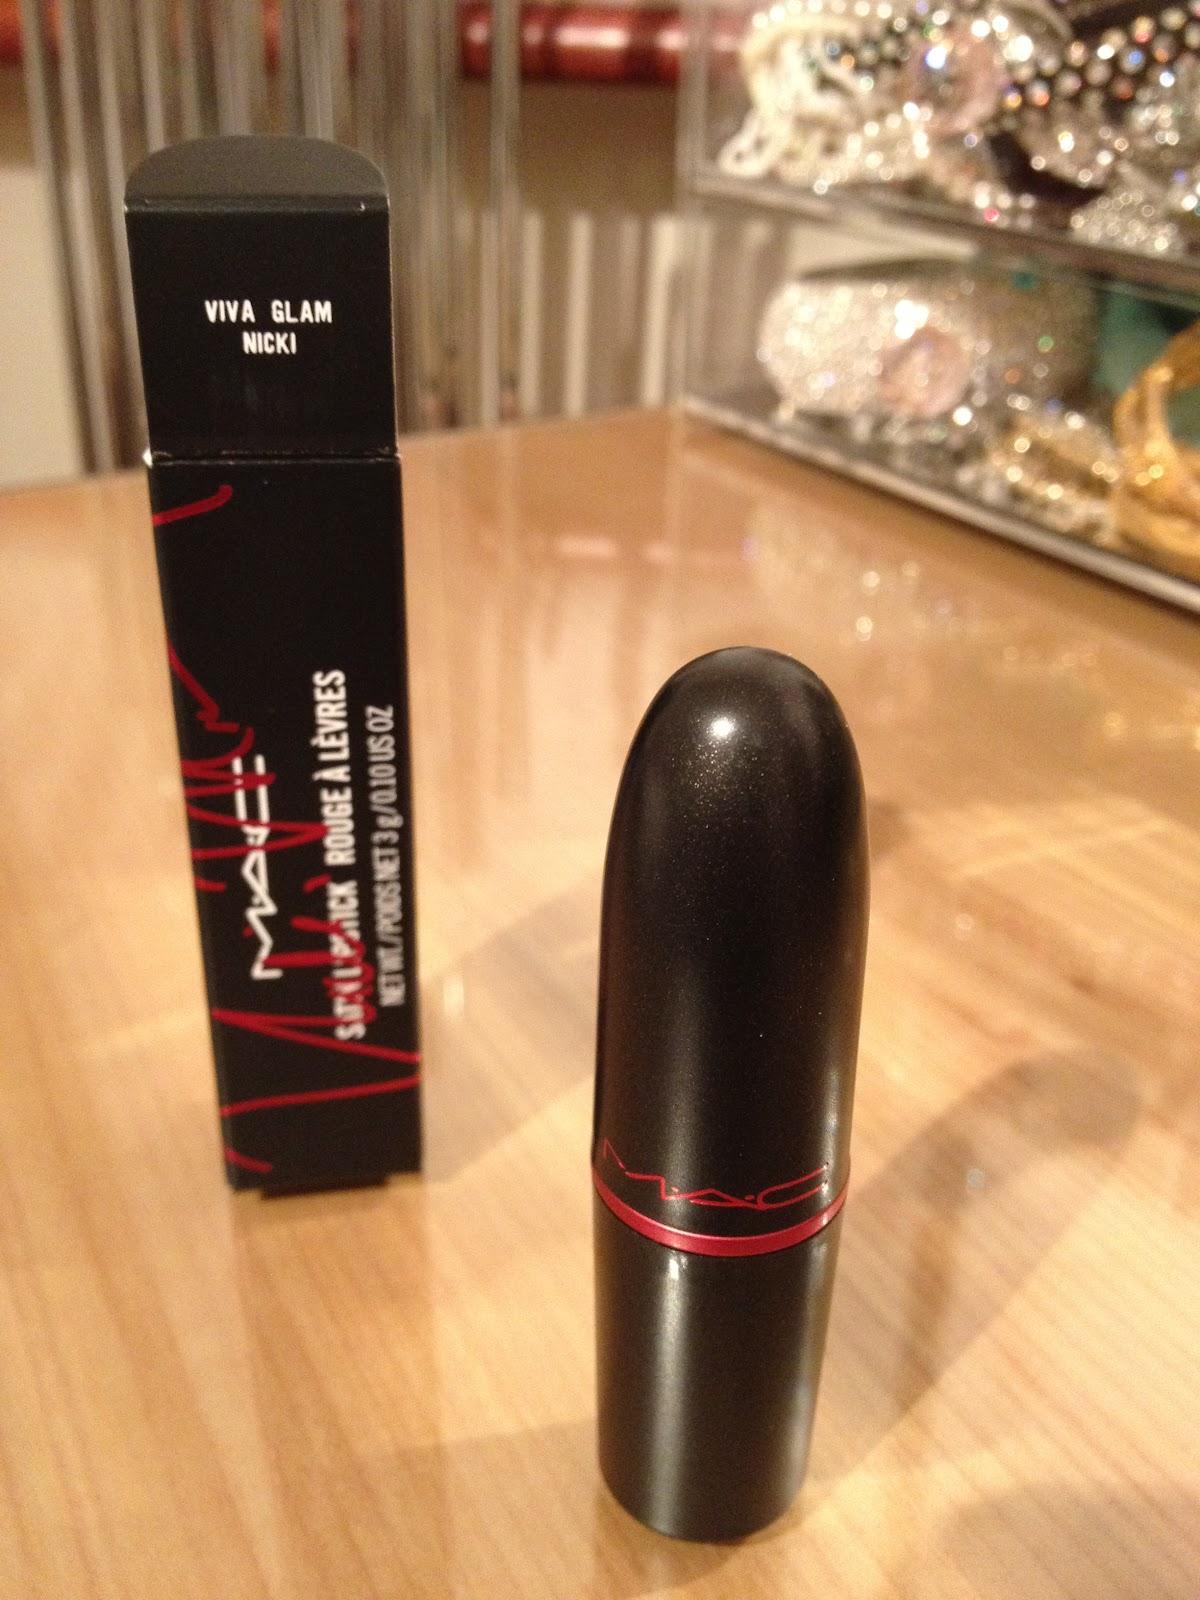 http://1.bp.blogspot.com/--lLaLKzcgKA/T1AOV9Mez7I/AAAAAAAABzc/V4ipoHF-l6A/s1600/MAC+Viva+Glam+Nicki+Lipstick+Review+Swatch+3.JPG